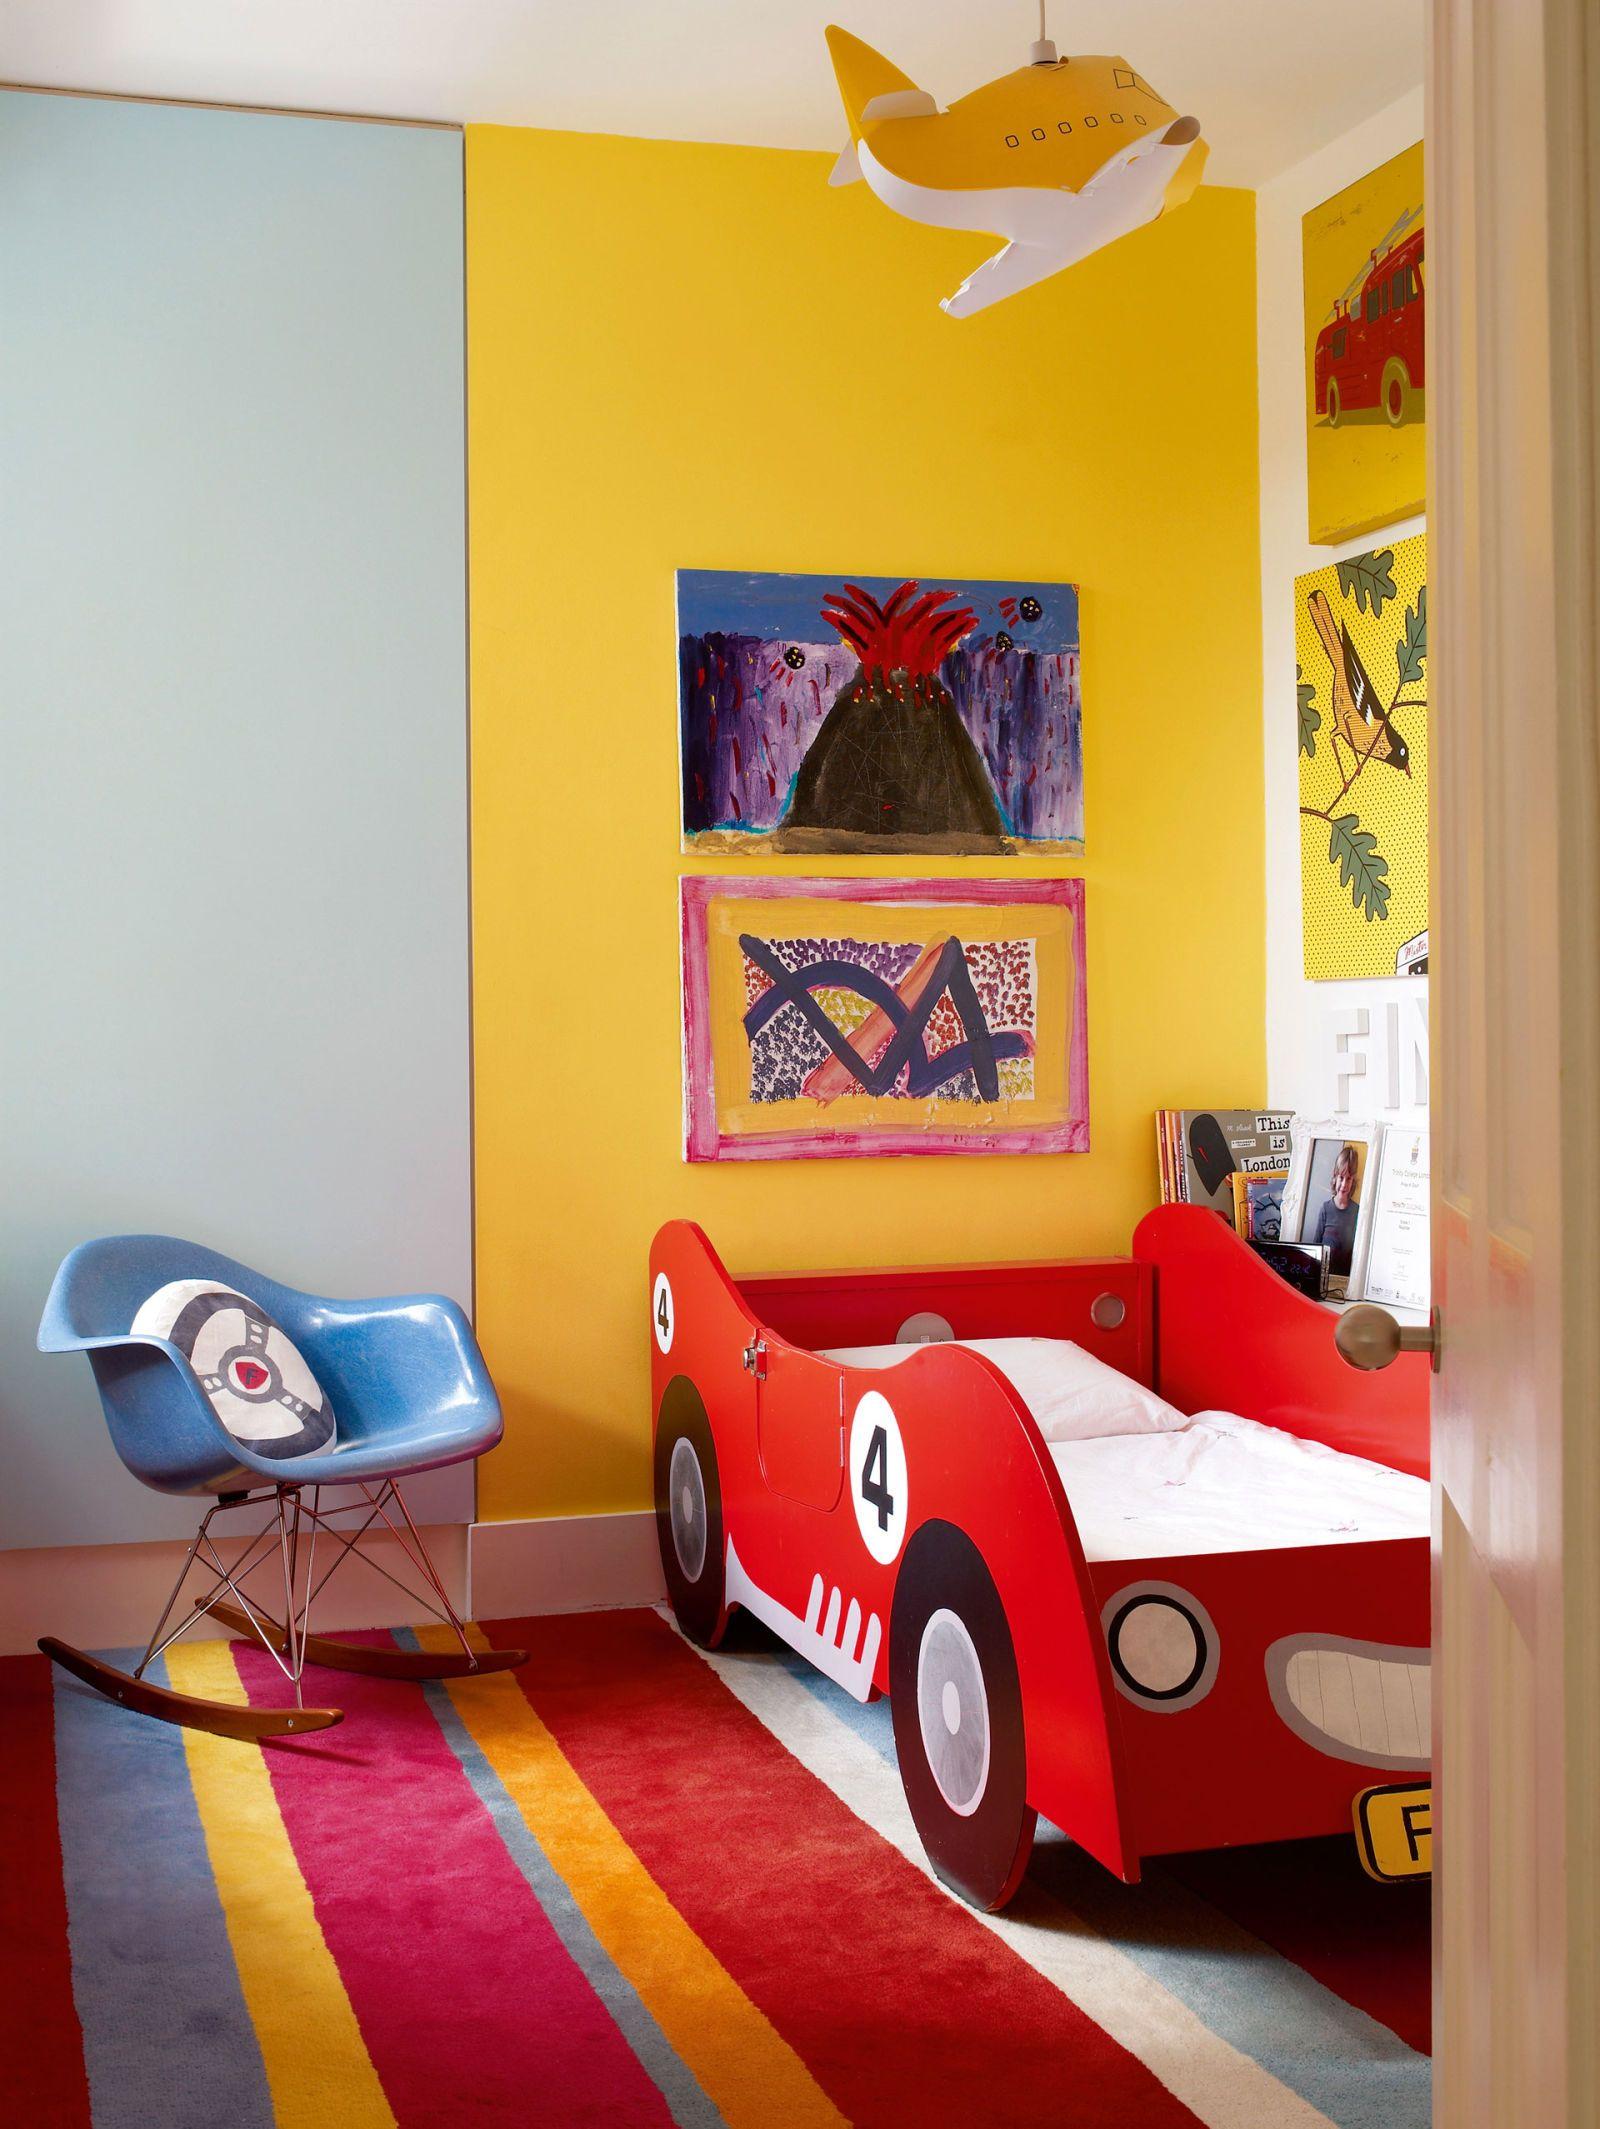 Kids Wall Art - Cool Wall Art for Kids Rooms